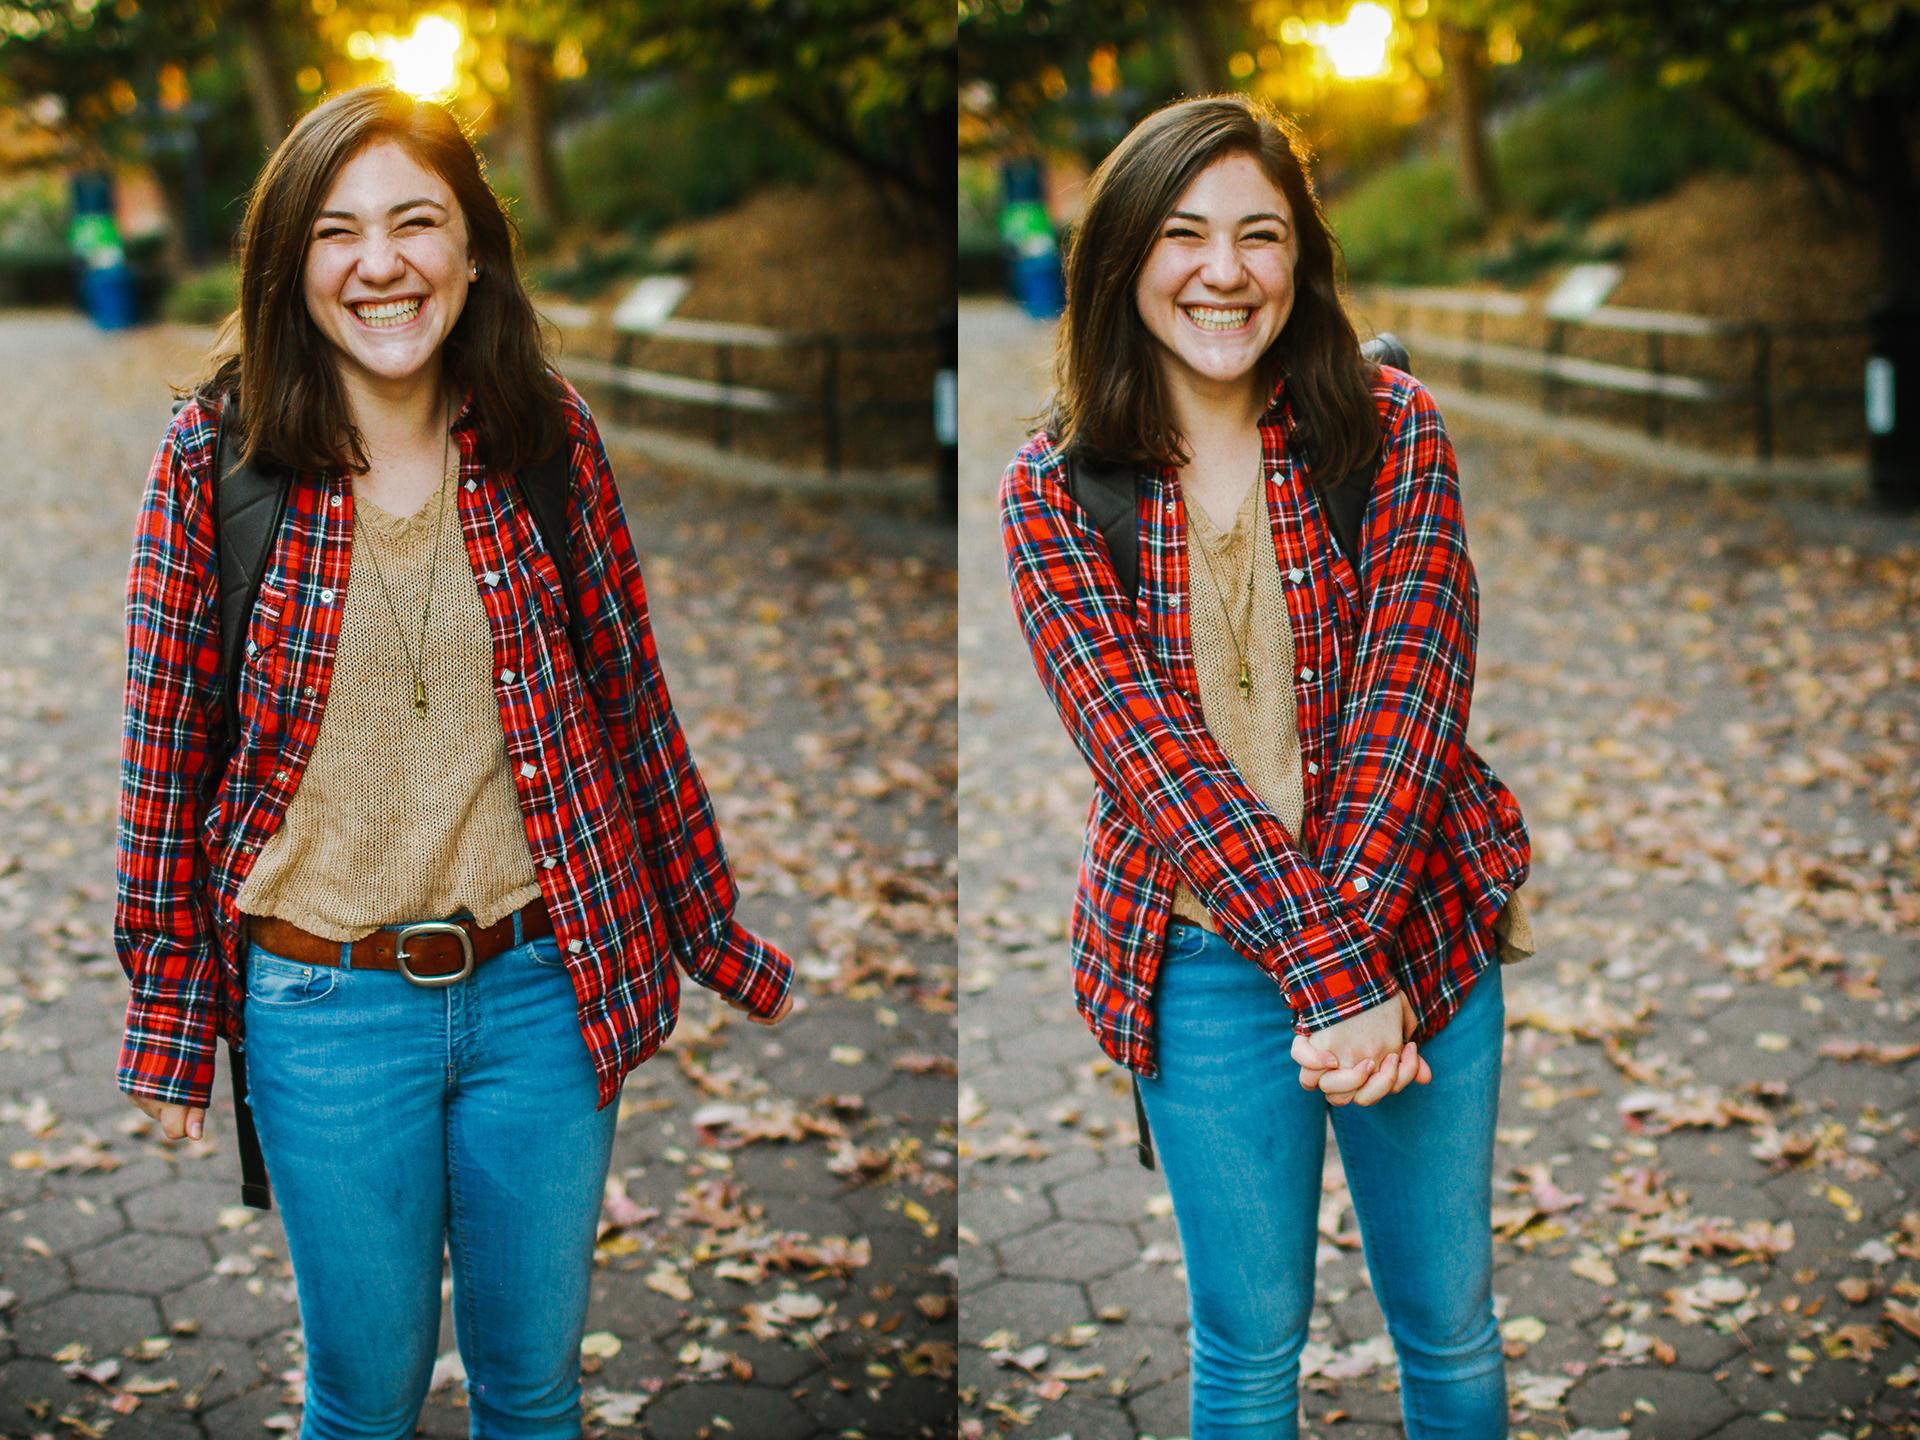 flannel rustic cute fall portrait.jpg